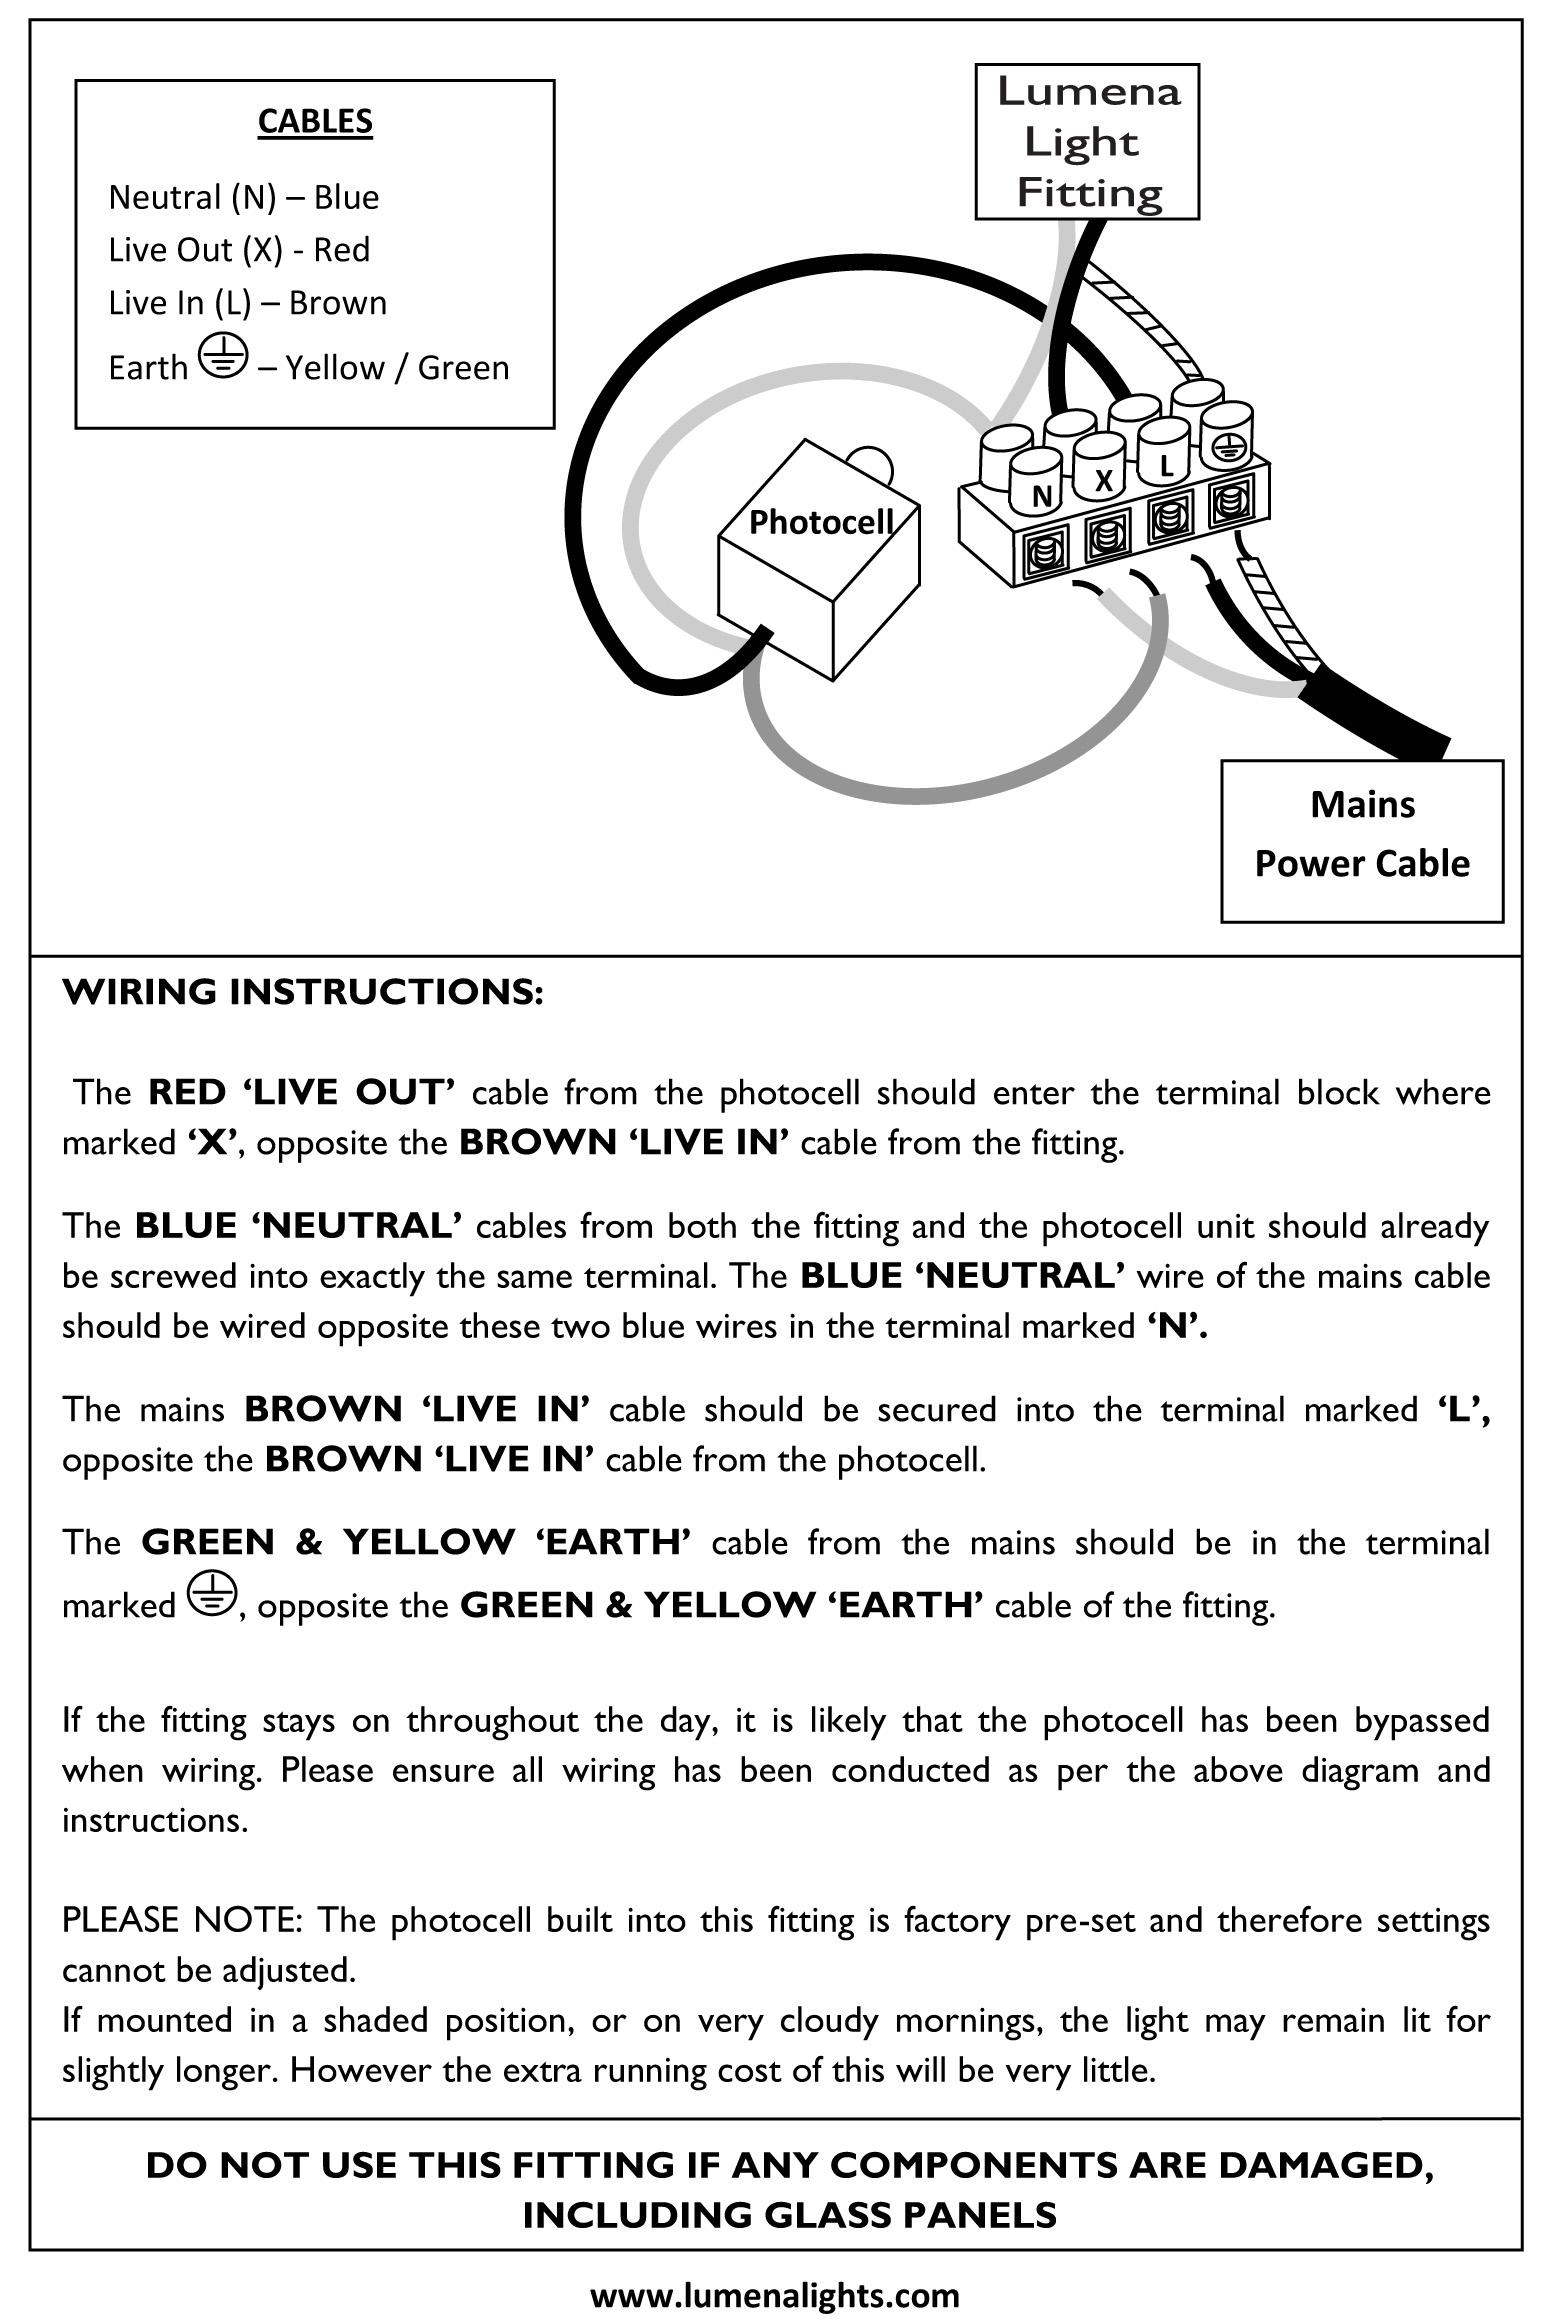 240 volt photocell wiring diagram remote starter 240v instructions31 lumena lights